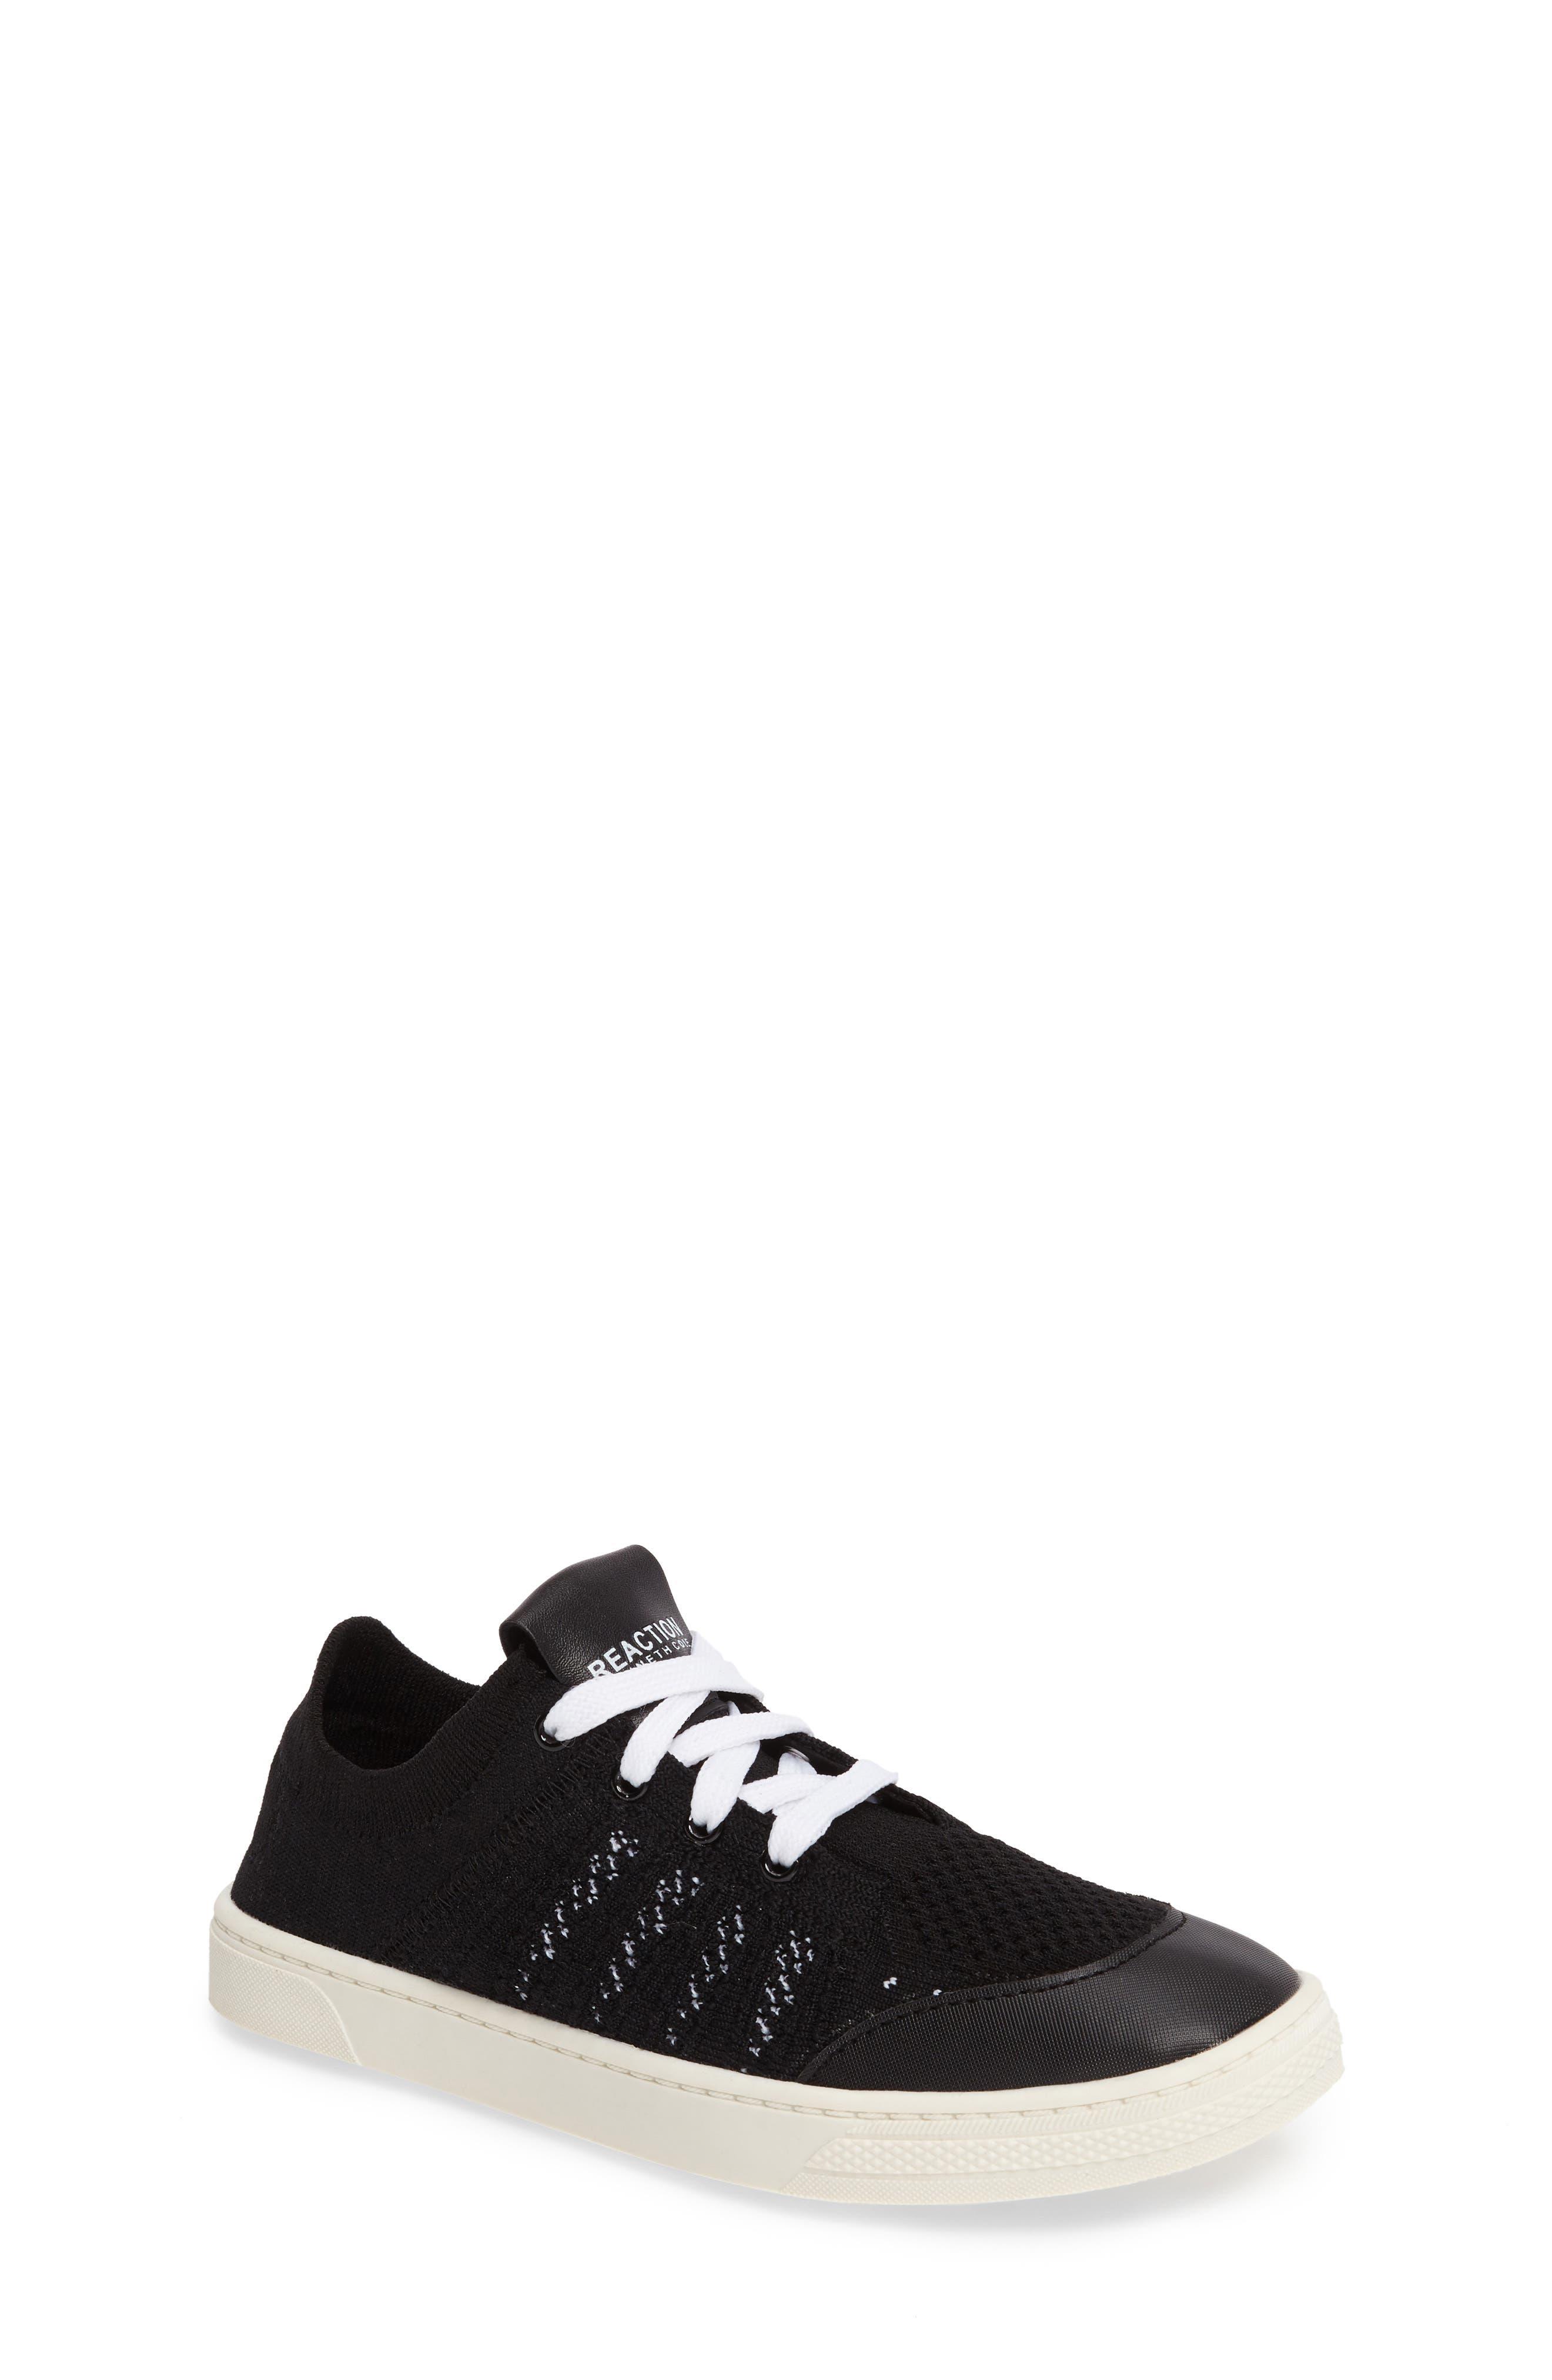 Kick Insight Woven Sneaker,                             Main thumbnail 1, color,                             001